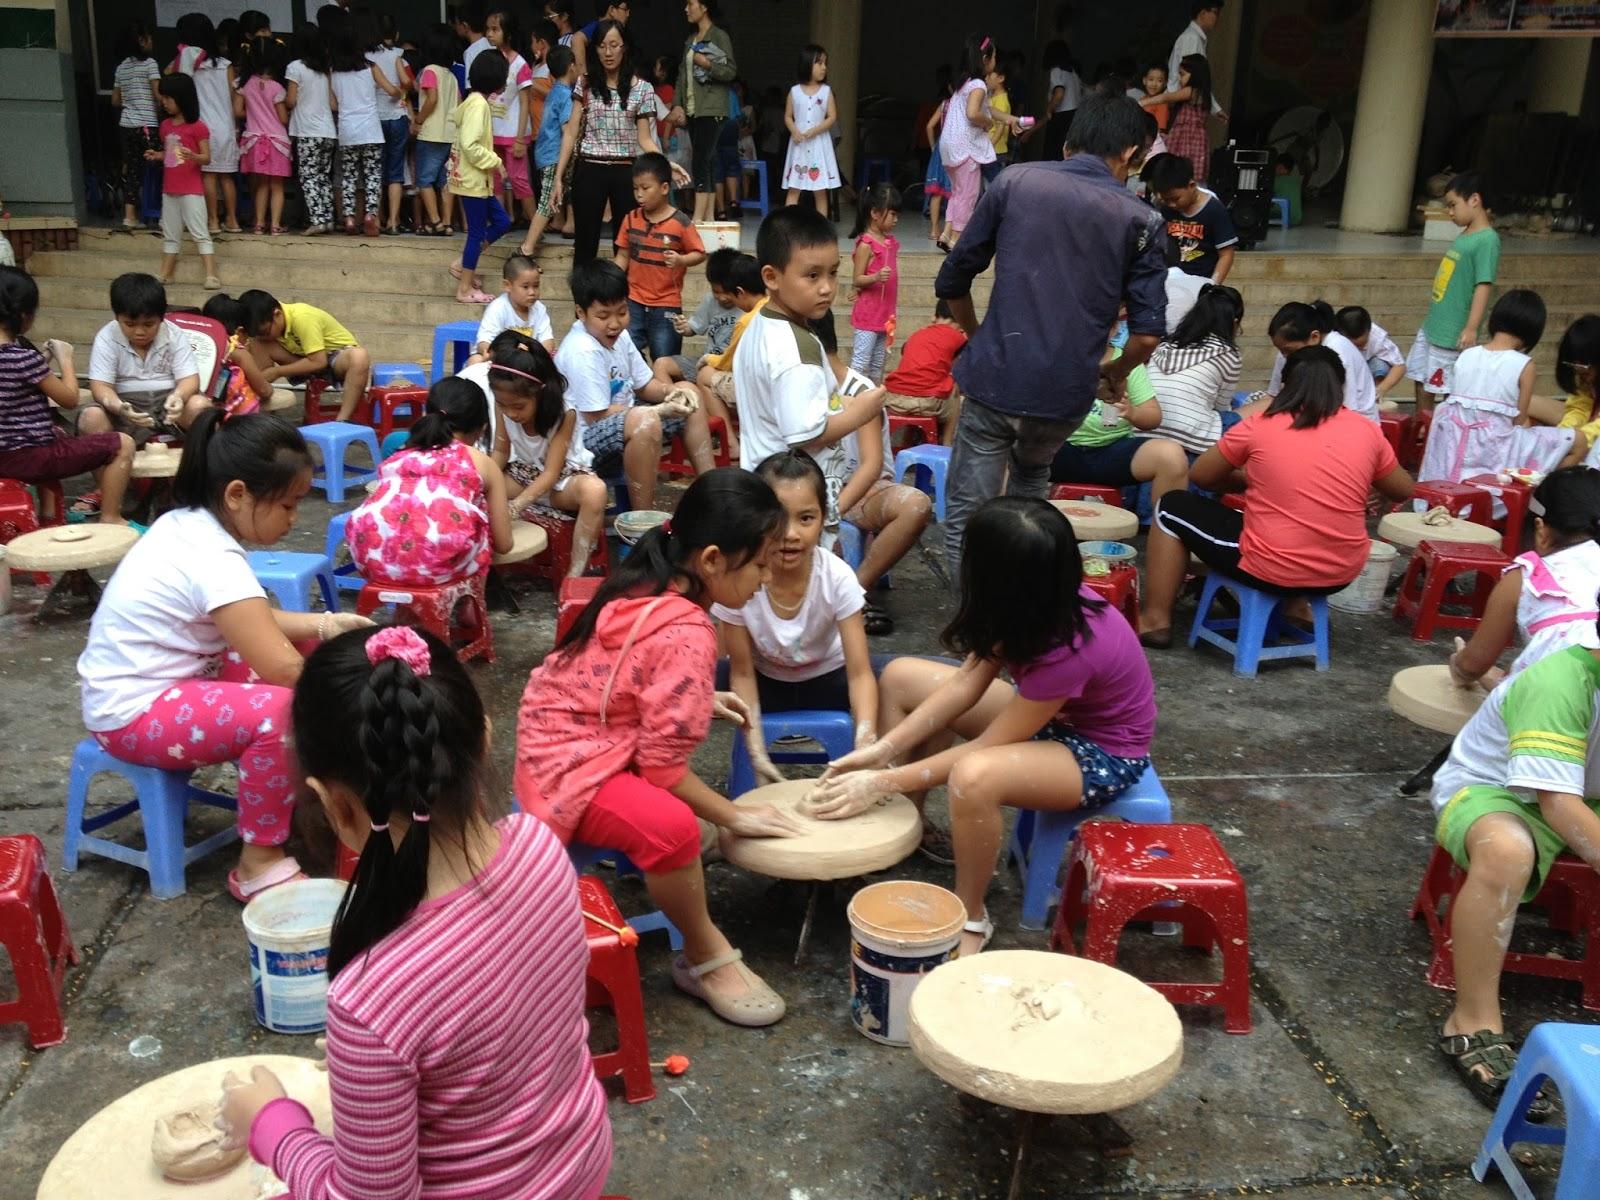 Bat Trang pottery village Hanoi Vietnam 5